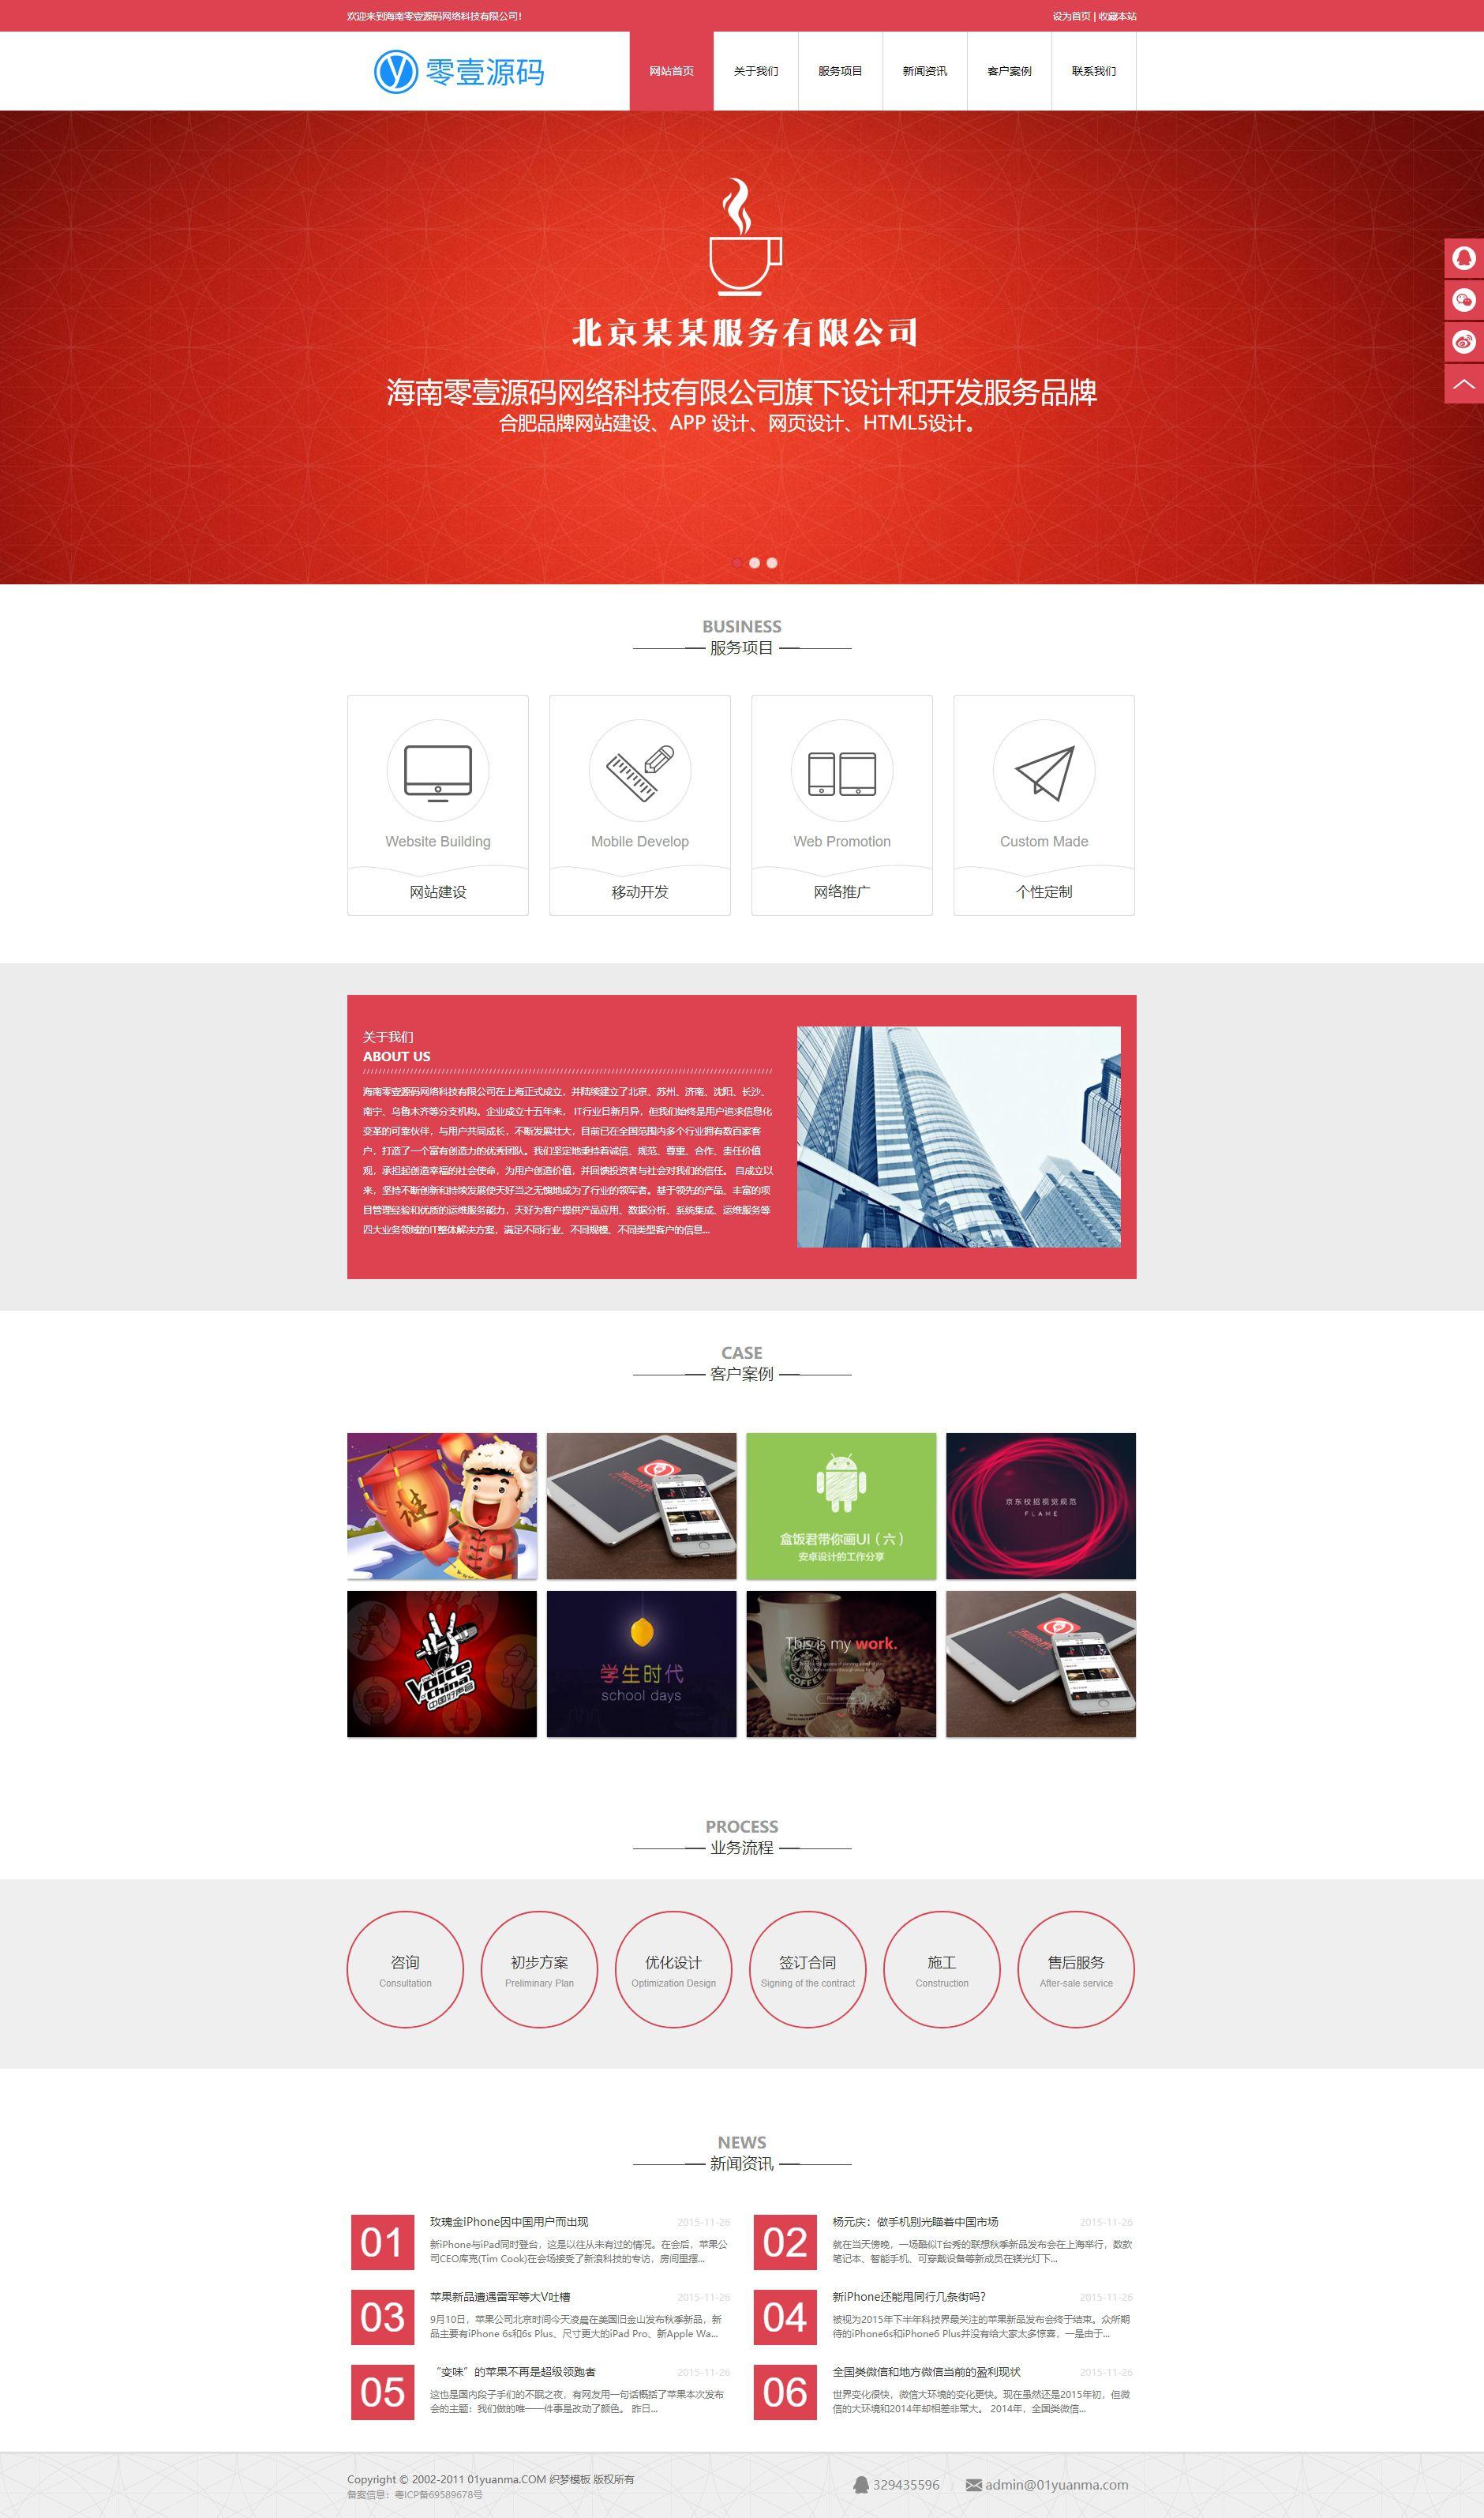 dedecms高端html5织梦网络公司模板